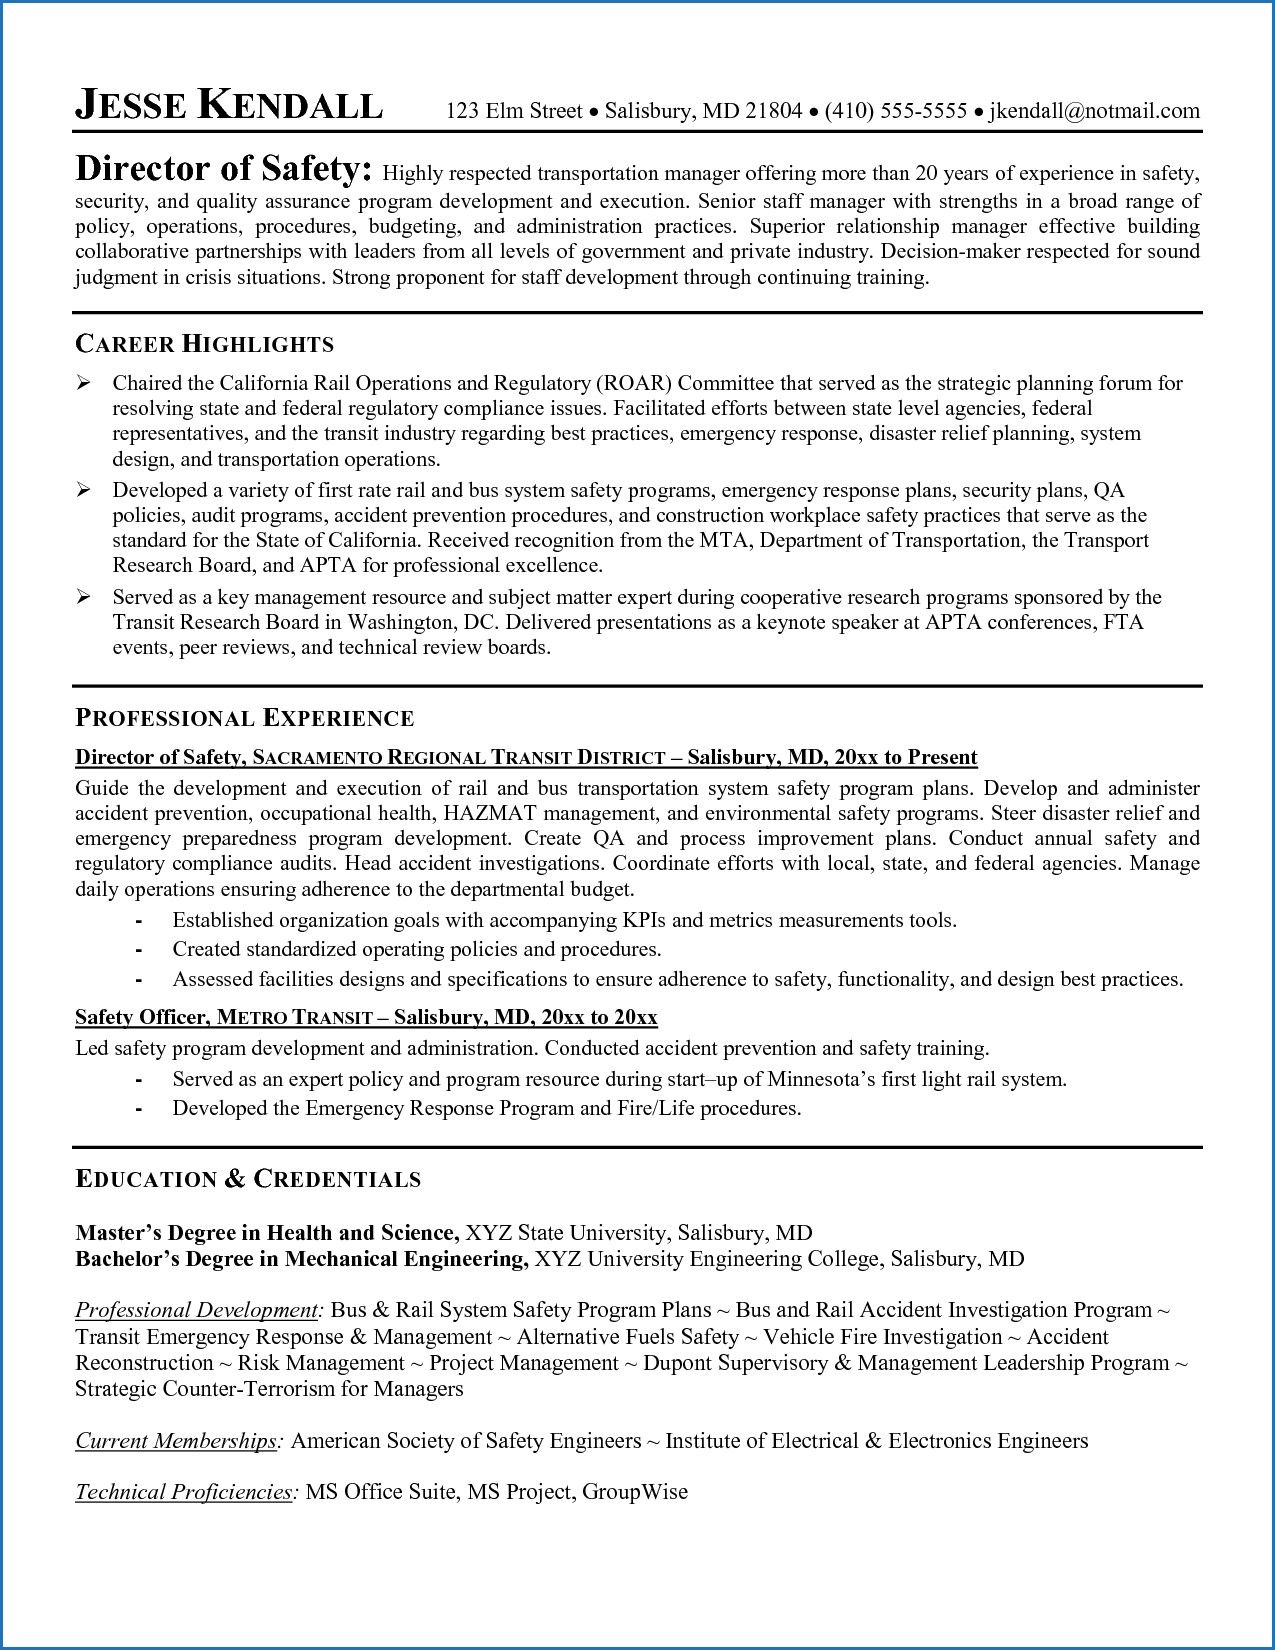 8 Resume Sample For Relationship Manager Check More At Https Www Ortelle Org Resume Sample For Relationship Manager